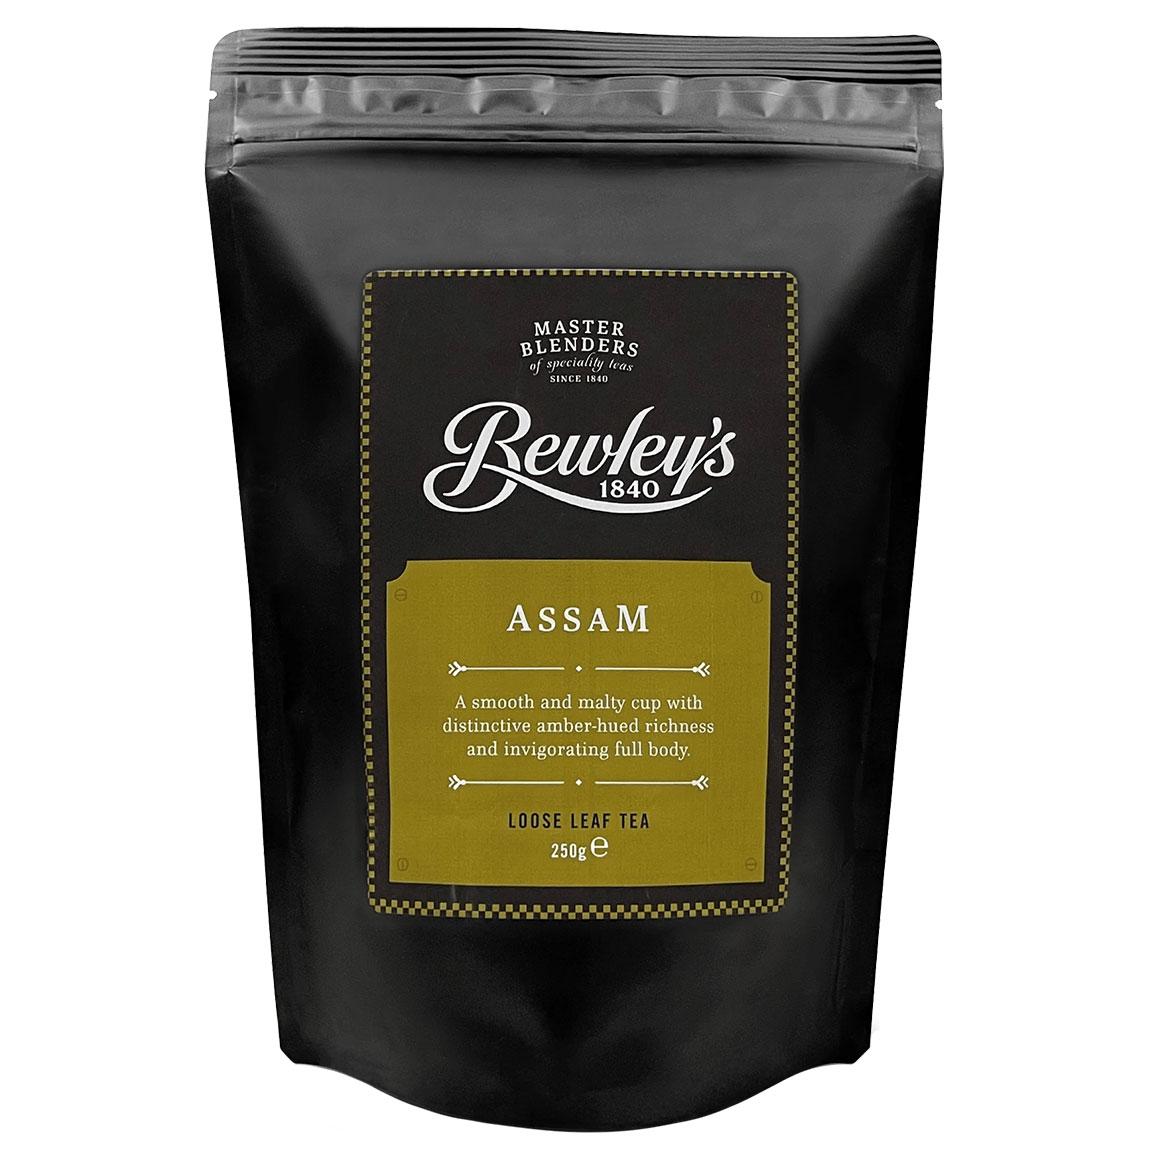 Bewley's Assam Loose Leaf Tea